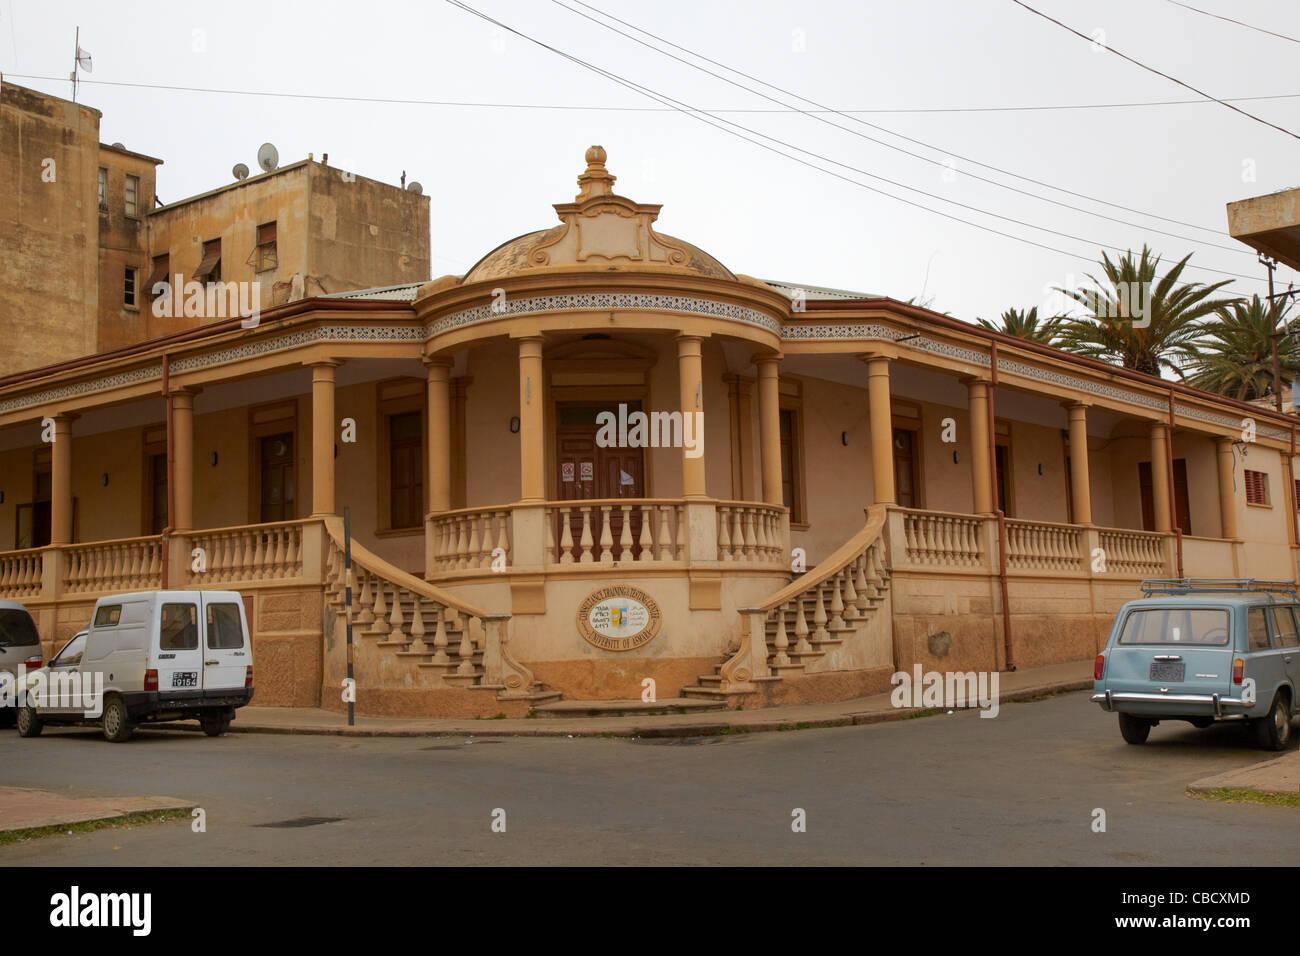 University of Asmara Training Center, Asmara, Eritrea